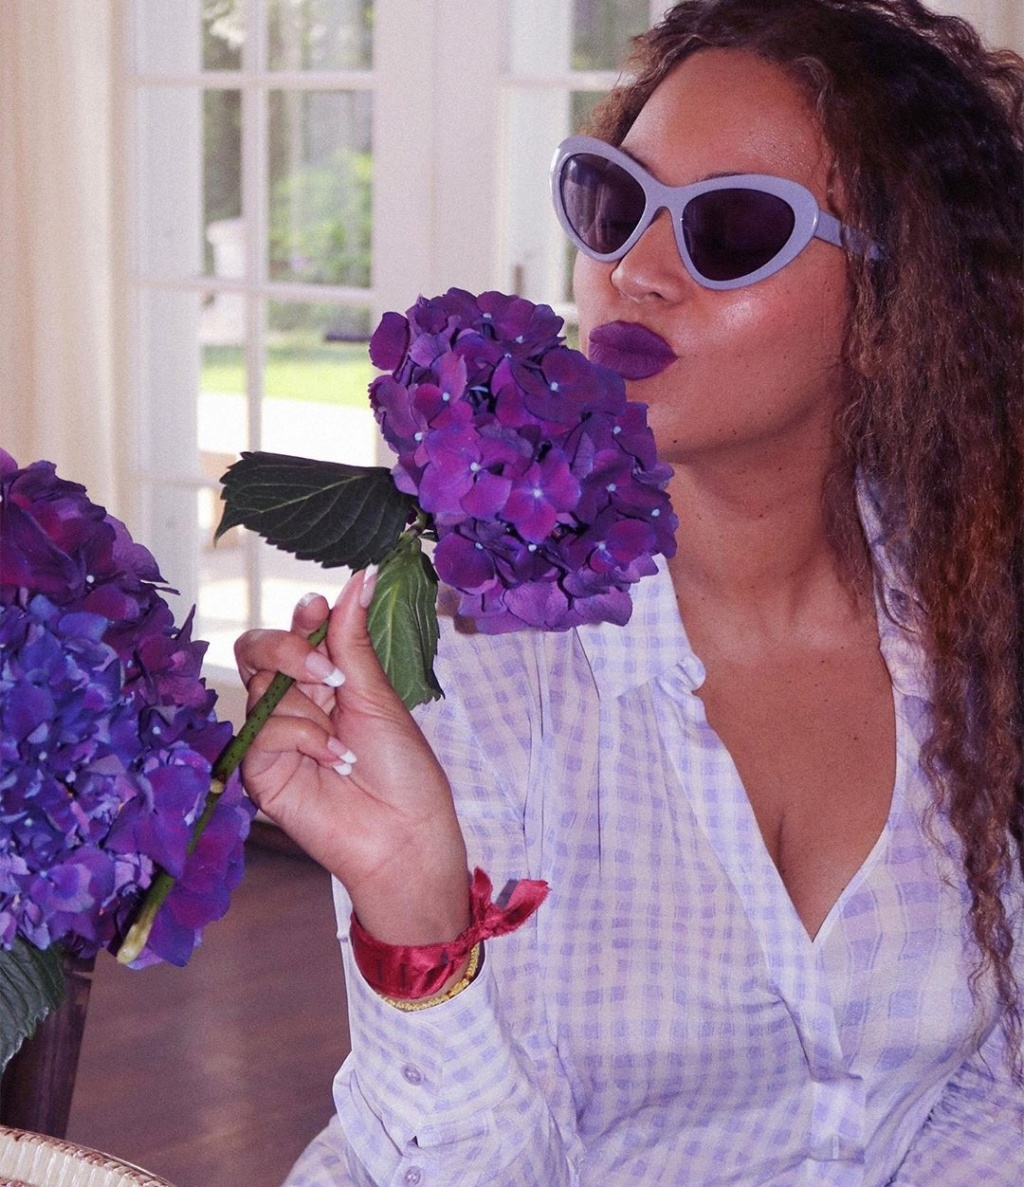 Beyoncé >> preparando nuevo álbum - Página 18 Img_2177